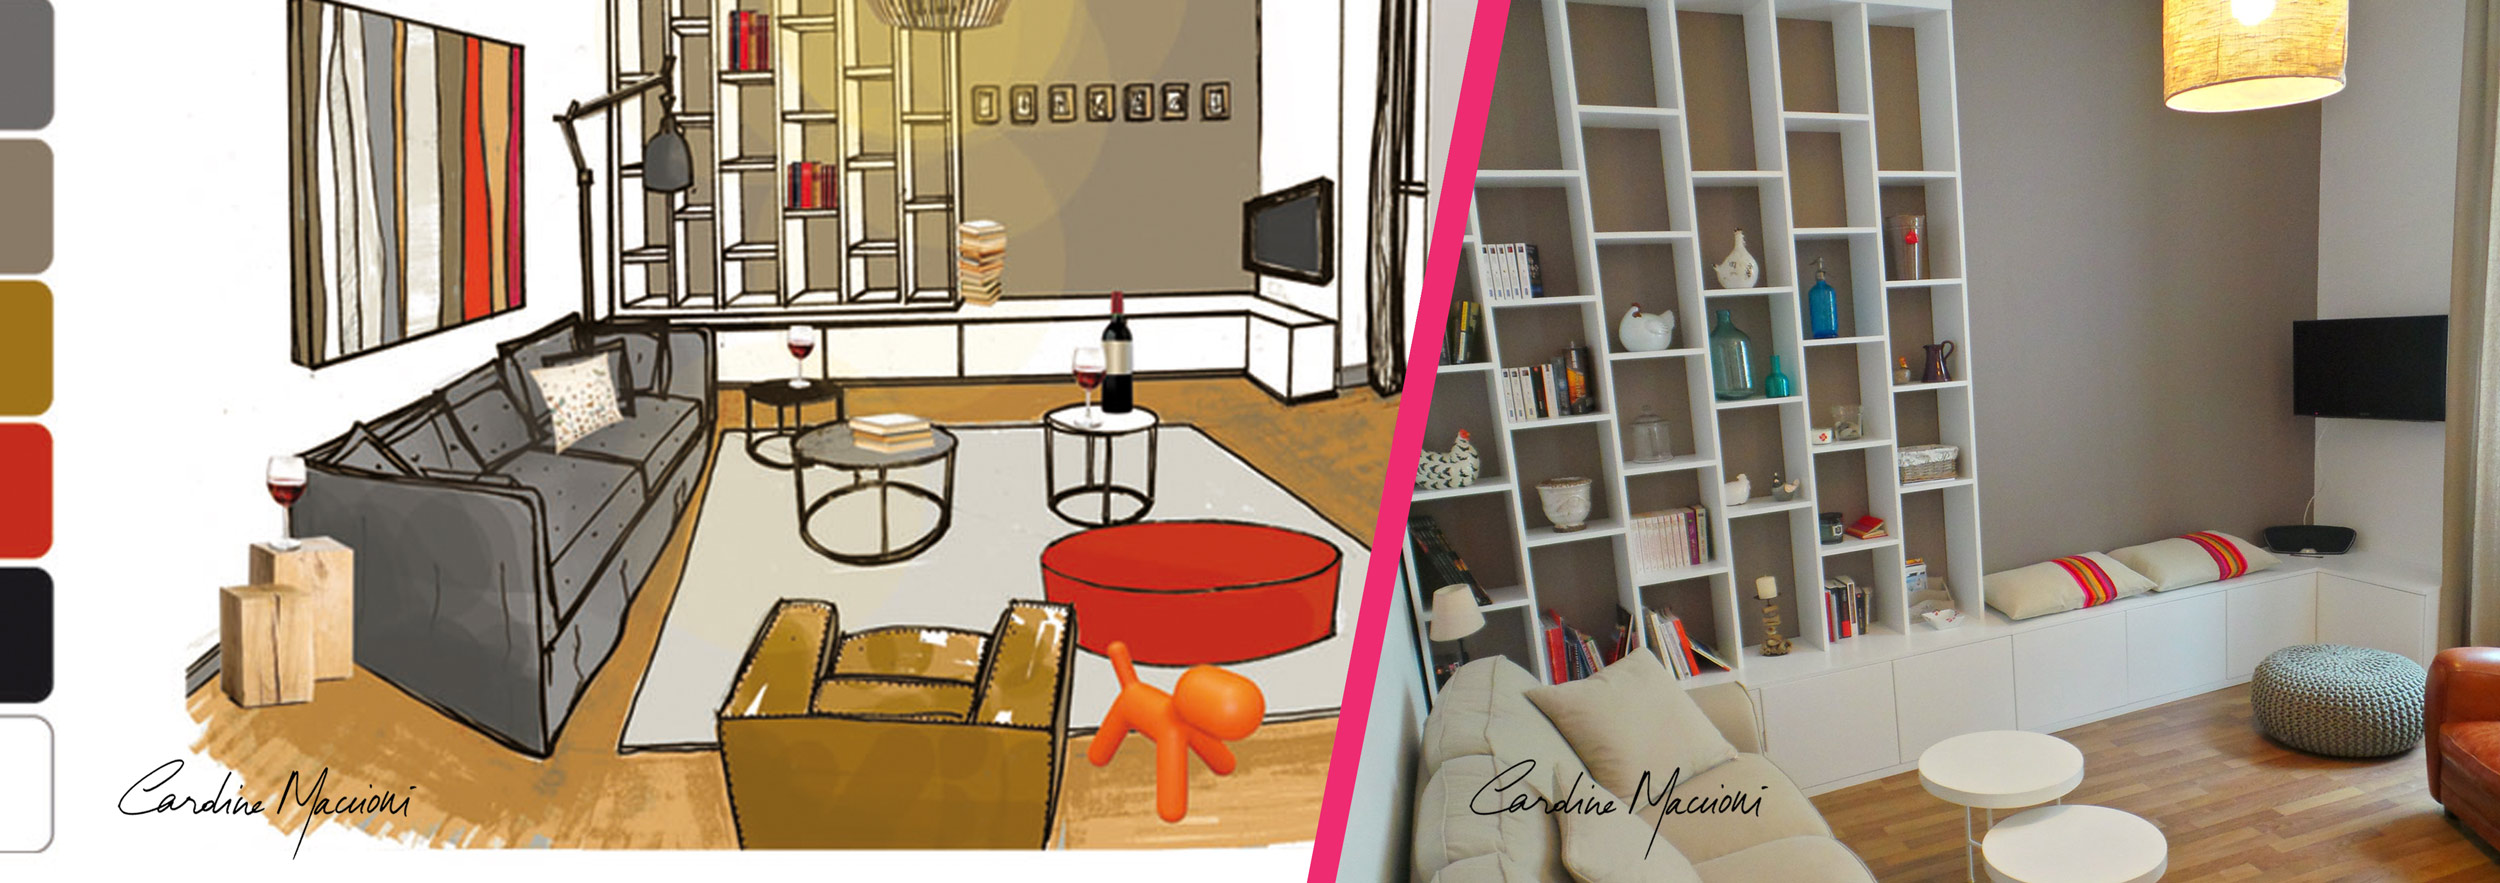 carolinemaccioni-decoratricedinterieur-design-biarritzcotebasque64-appartementchic-citadin-cosy-chaleureux-238